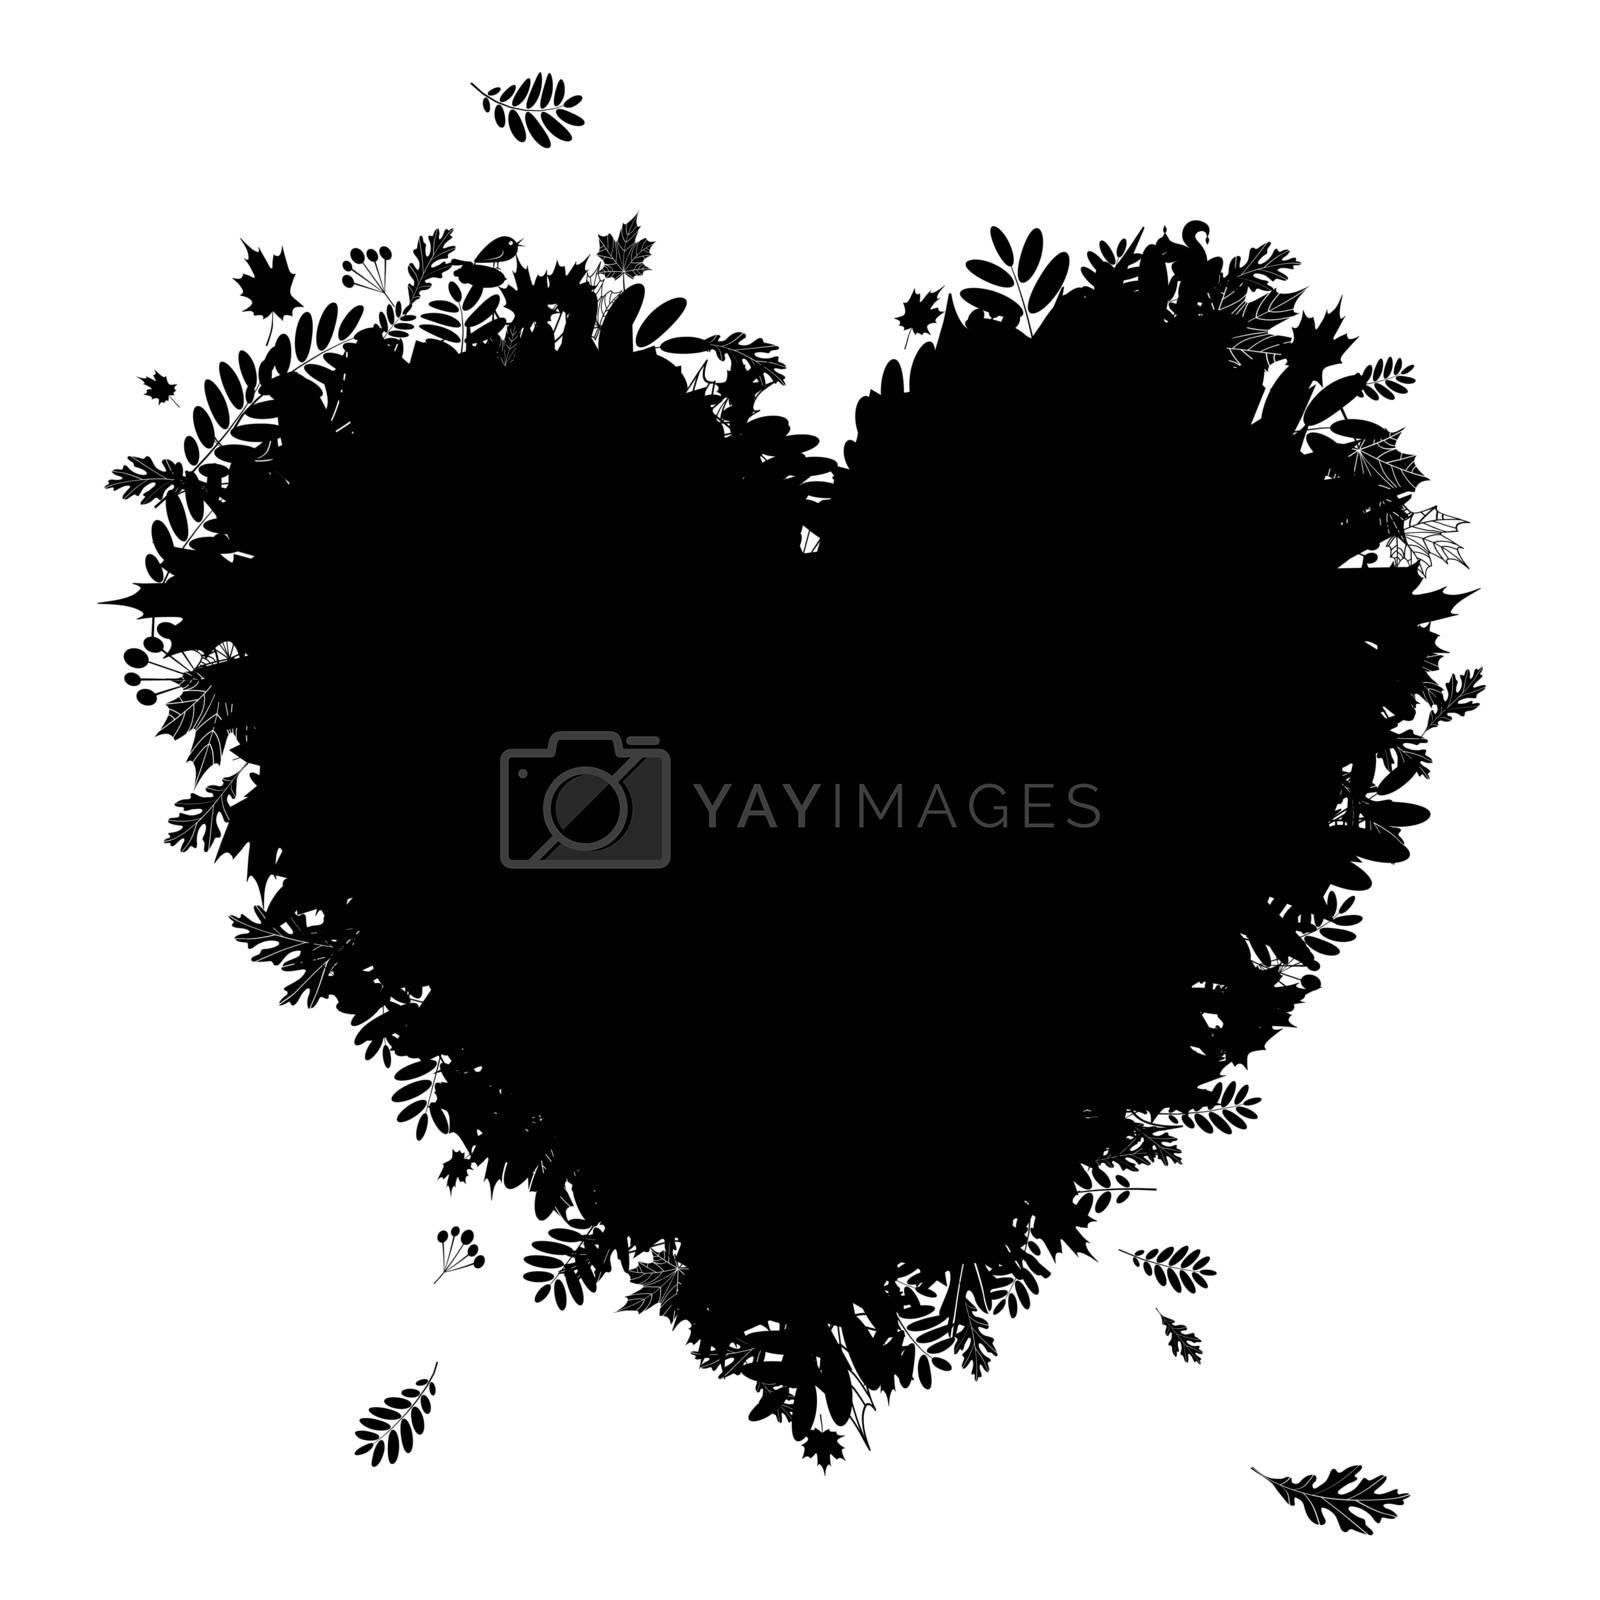 I love autumn! Heart shape from falling leaves, black silhouette